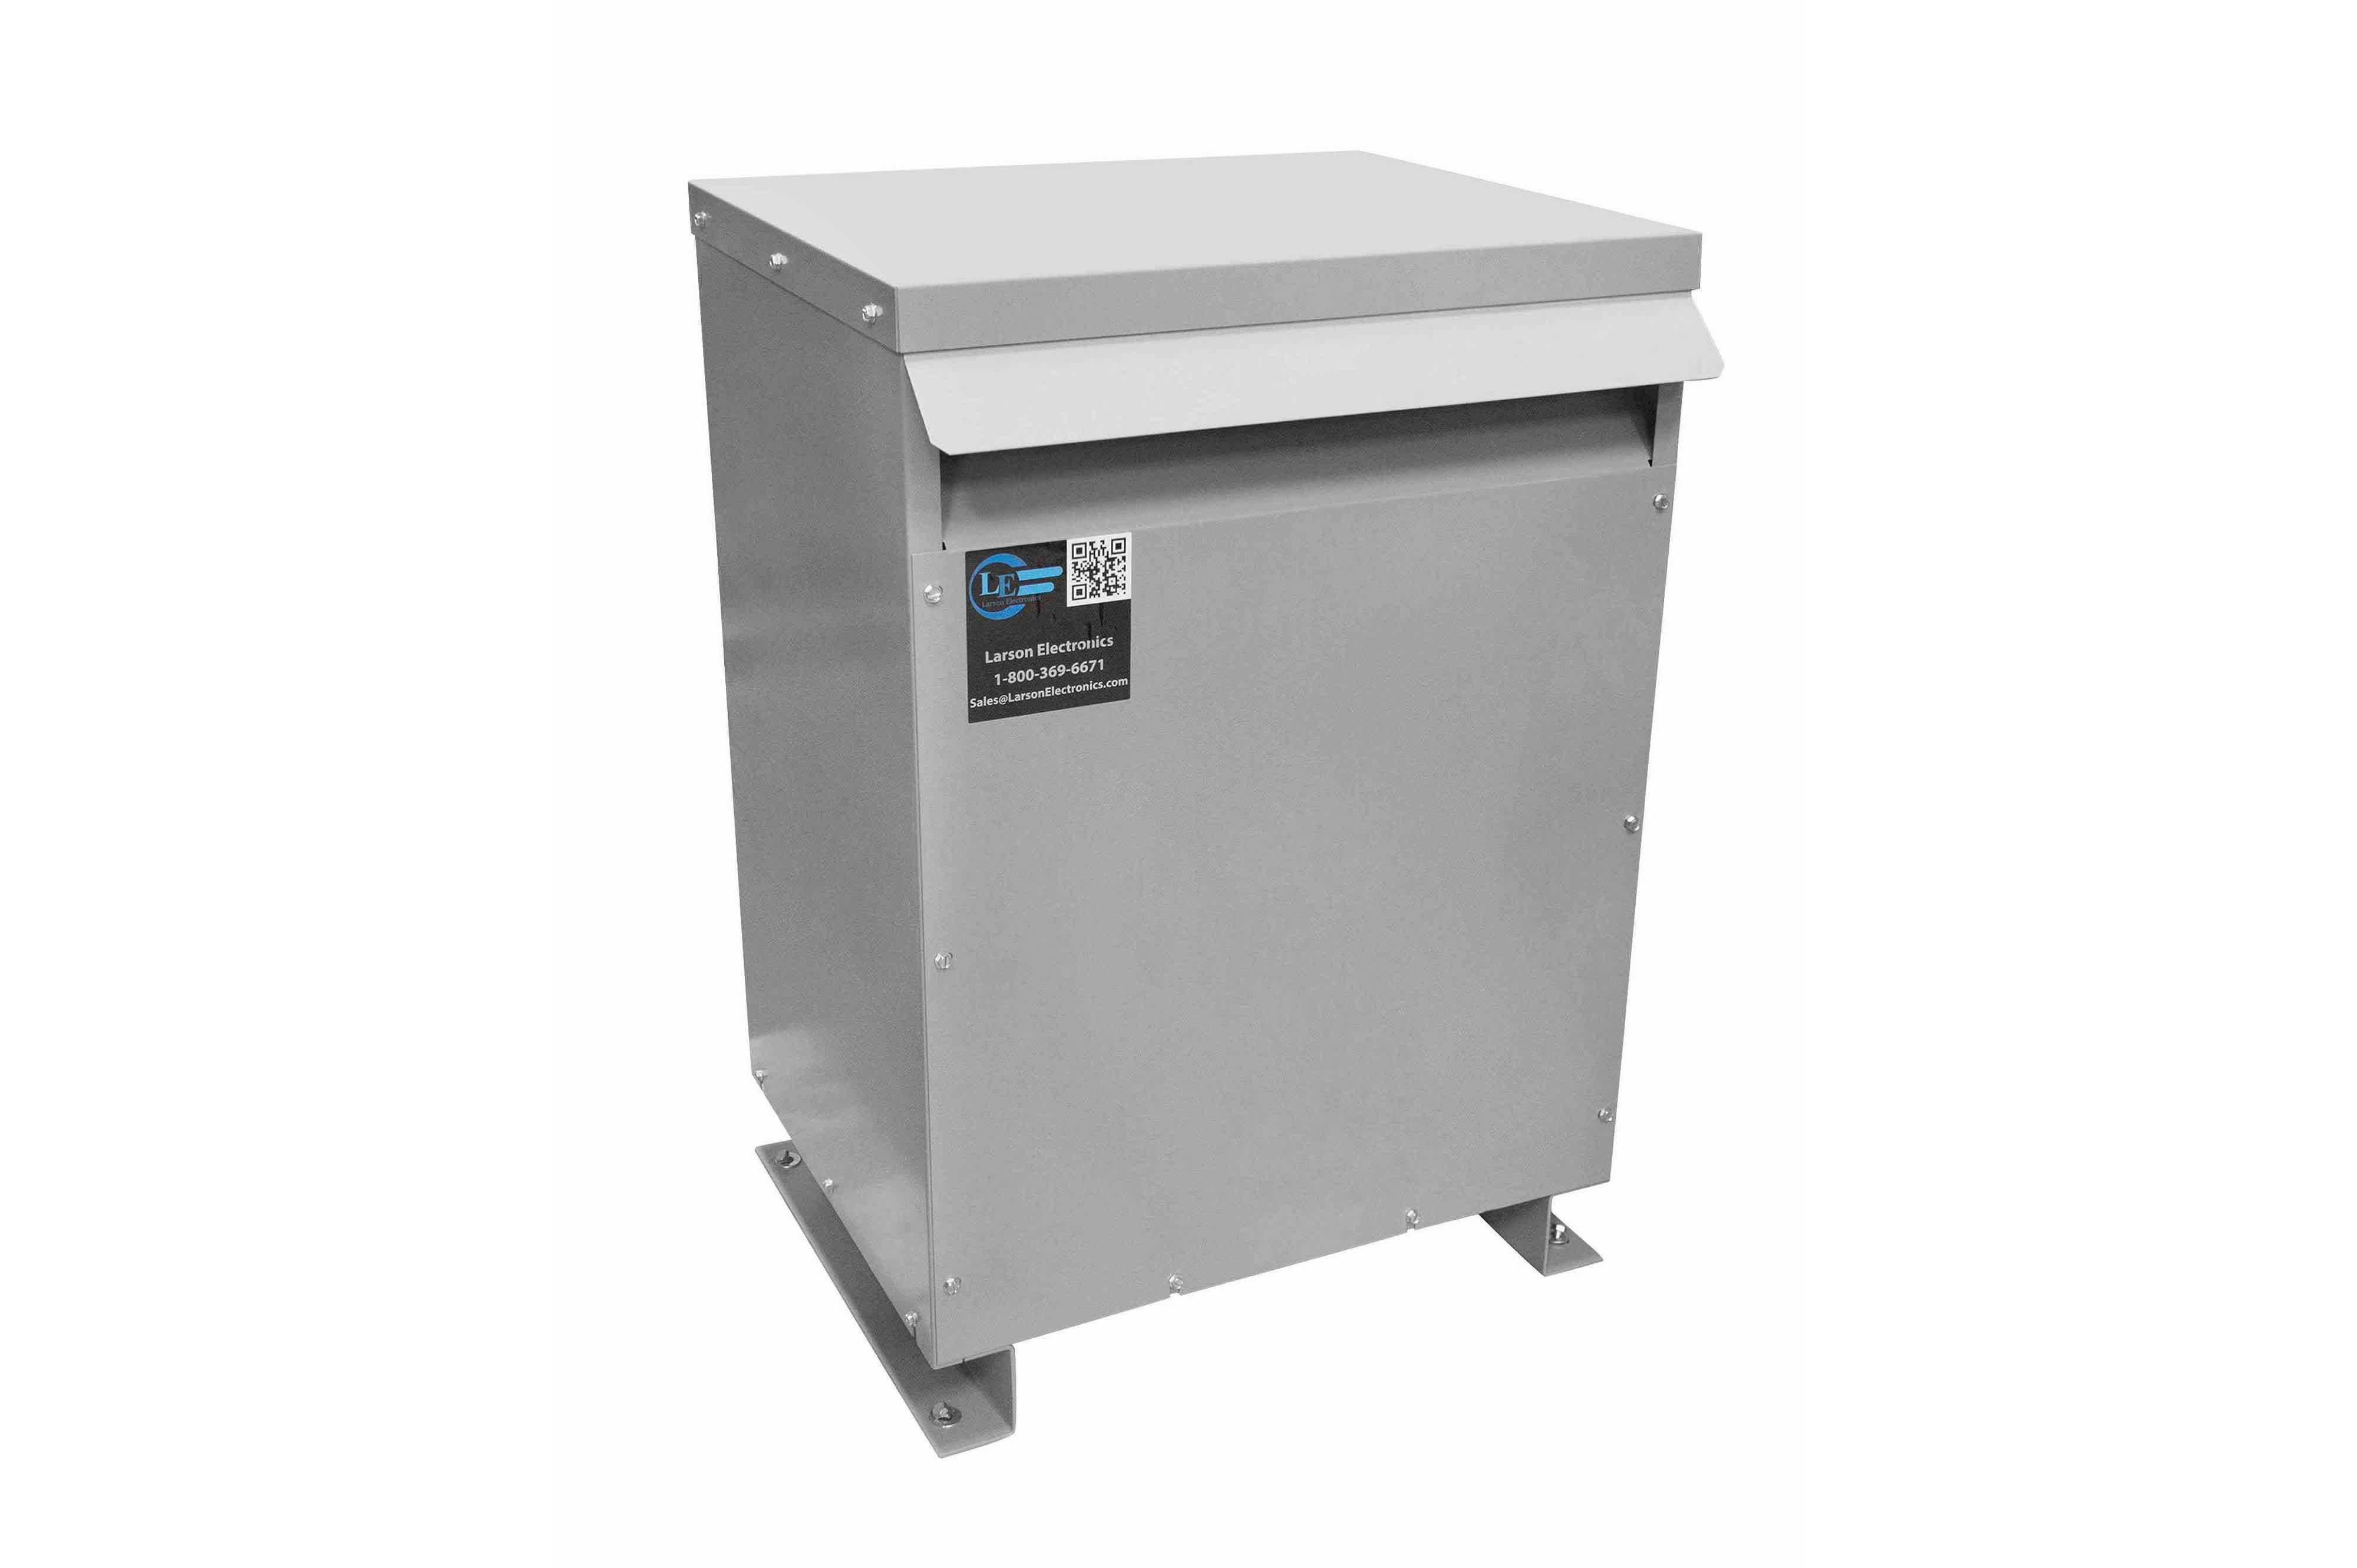 275 kVA 3PH Isolation Transformer, 380V Wye Primary, 240V Delta Secondary, N3R, Ventilated, 60 Hz